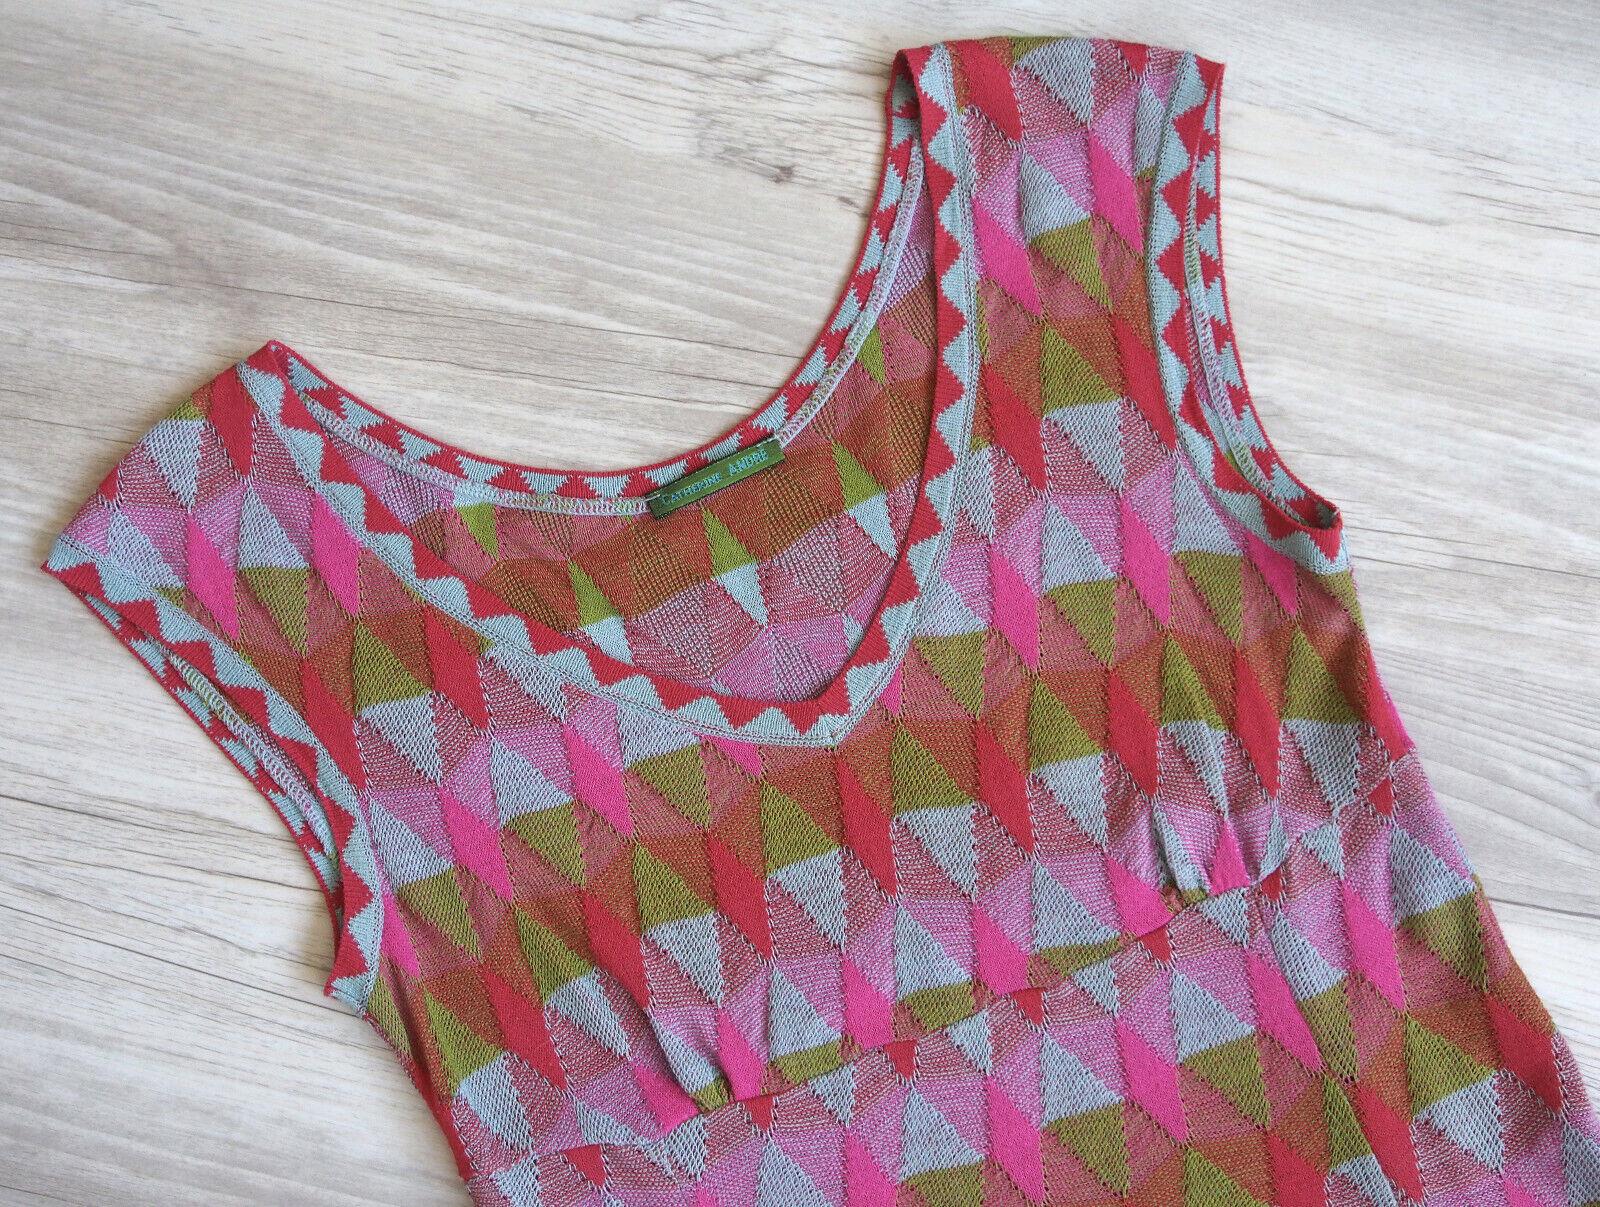 CATHERINE ANDRÉ Sommerkleid, türkis   oliv   Rosa   rot, Gr. M (fällt wie S aus)